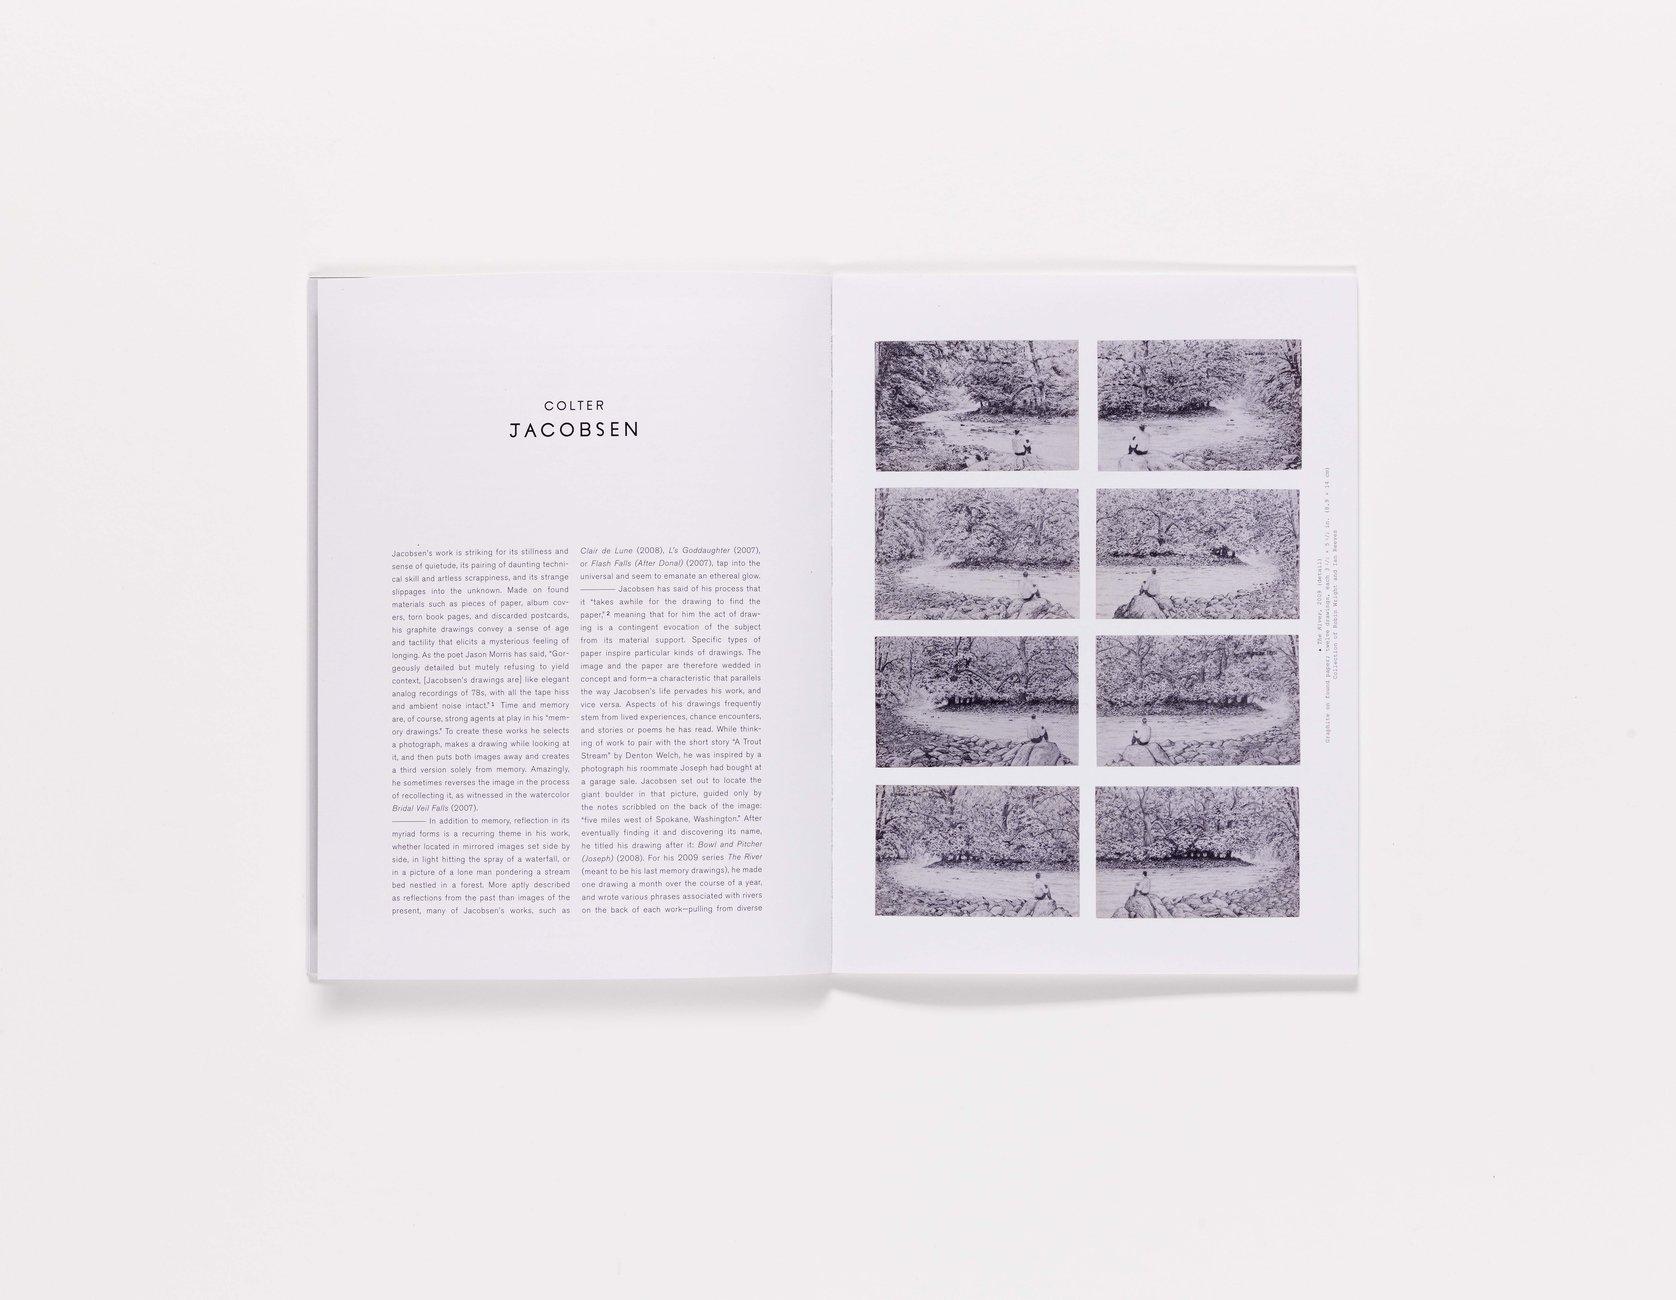 2010 SECA Art Award publication pages 12-13